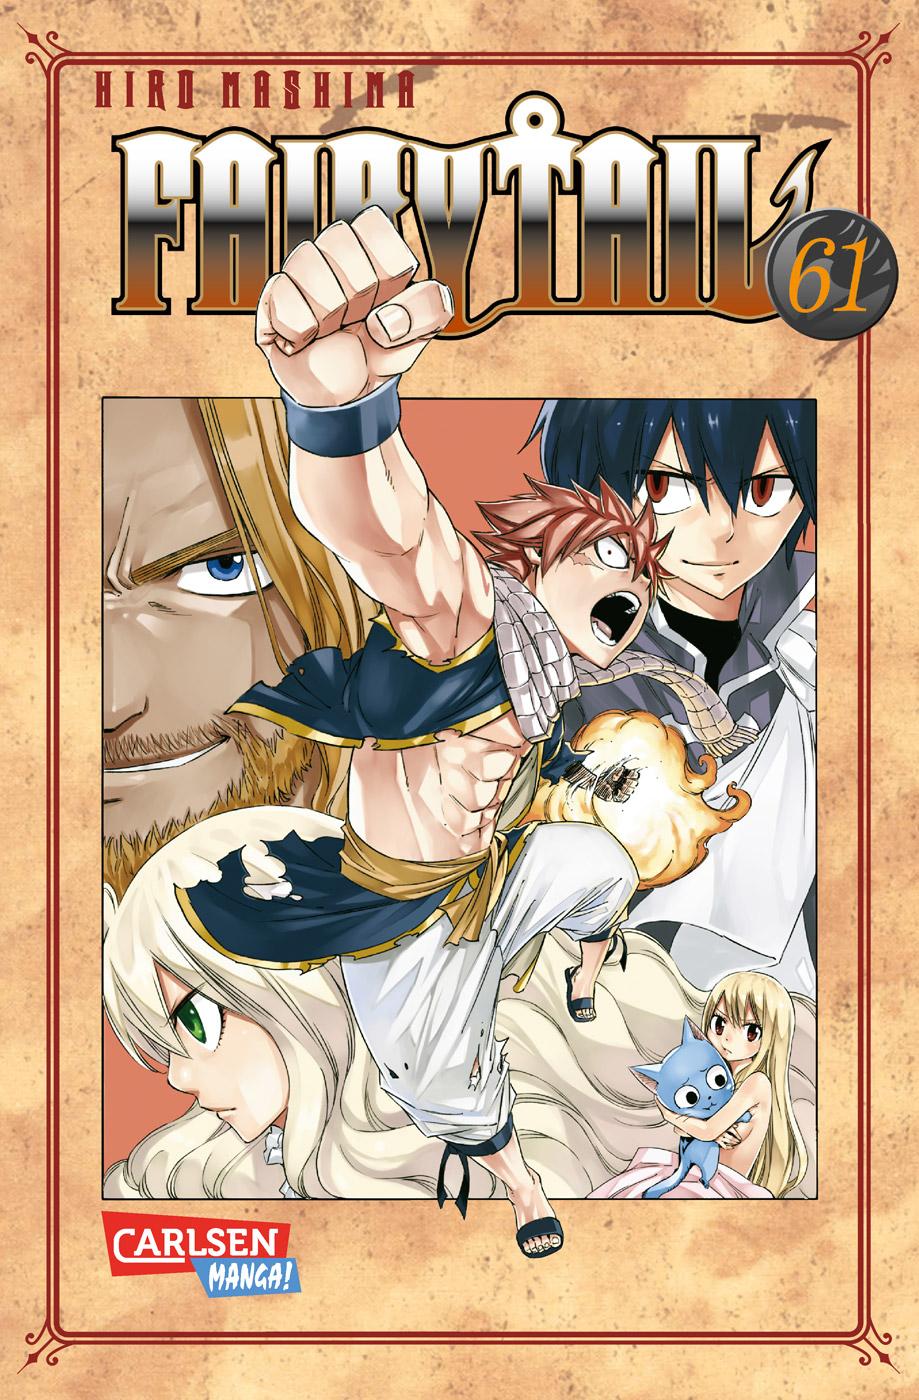 Fairy Tail Band 61 (Hiro Mashima) | Modern Graphics comics